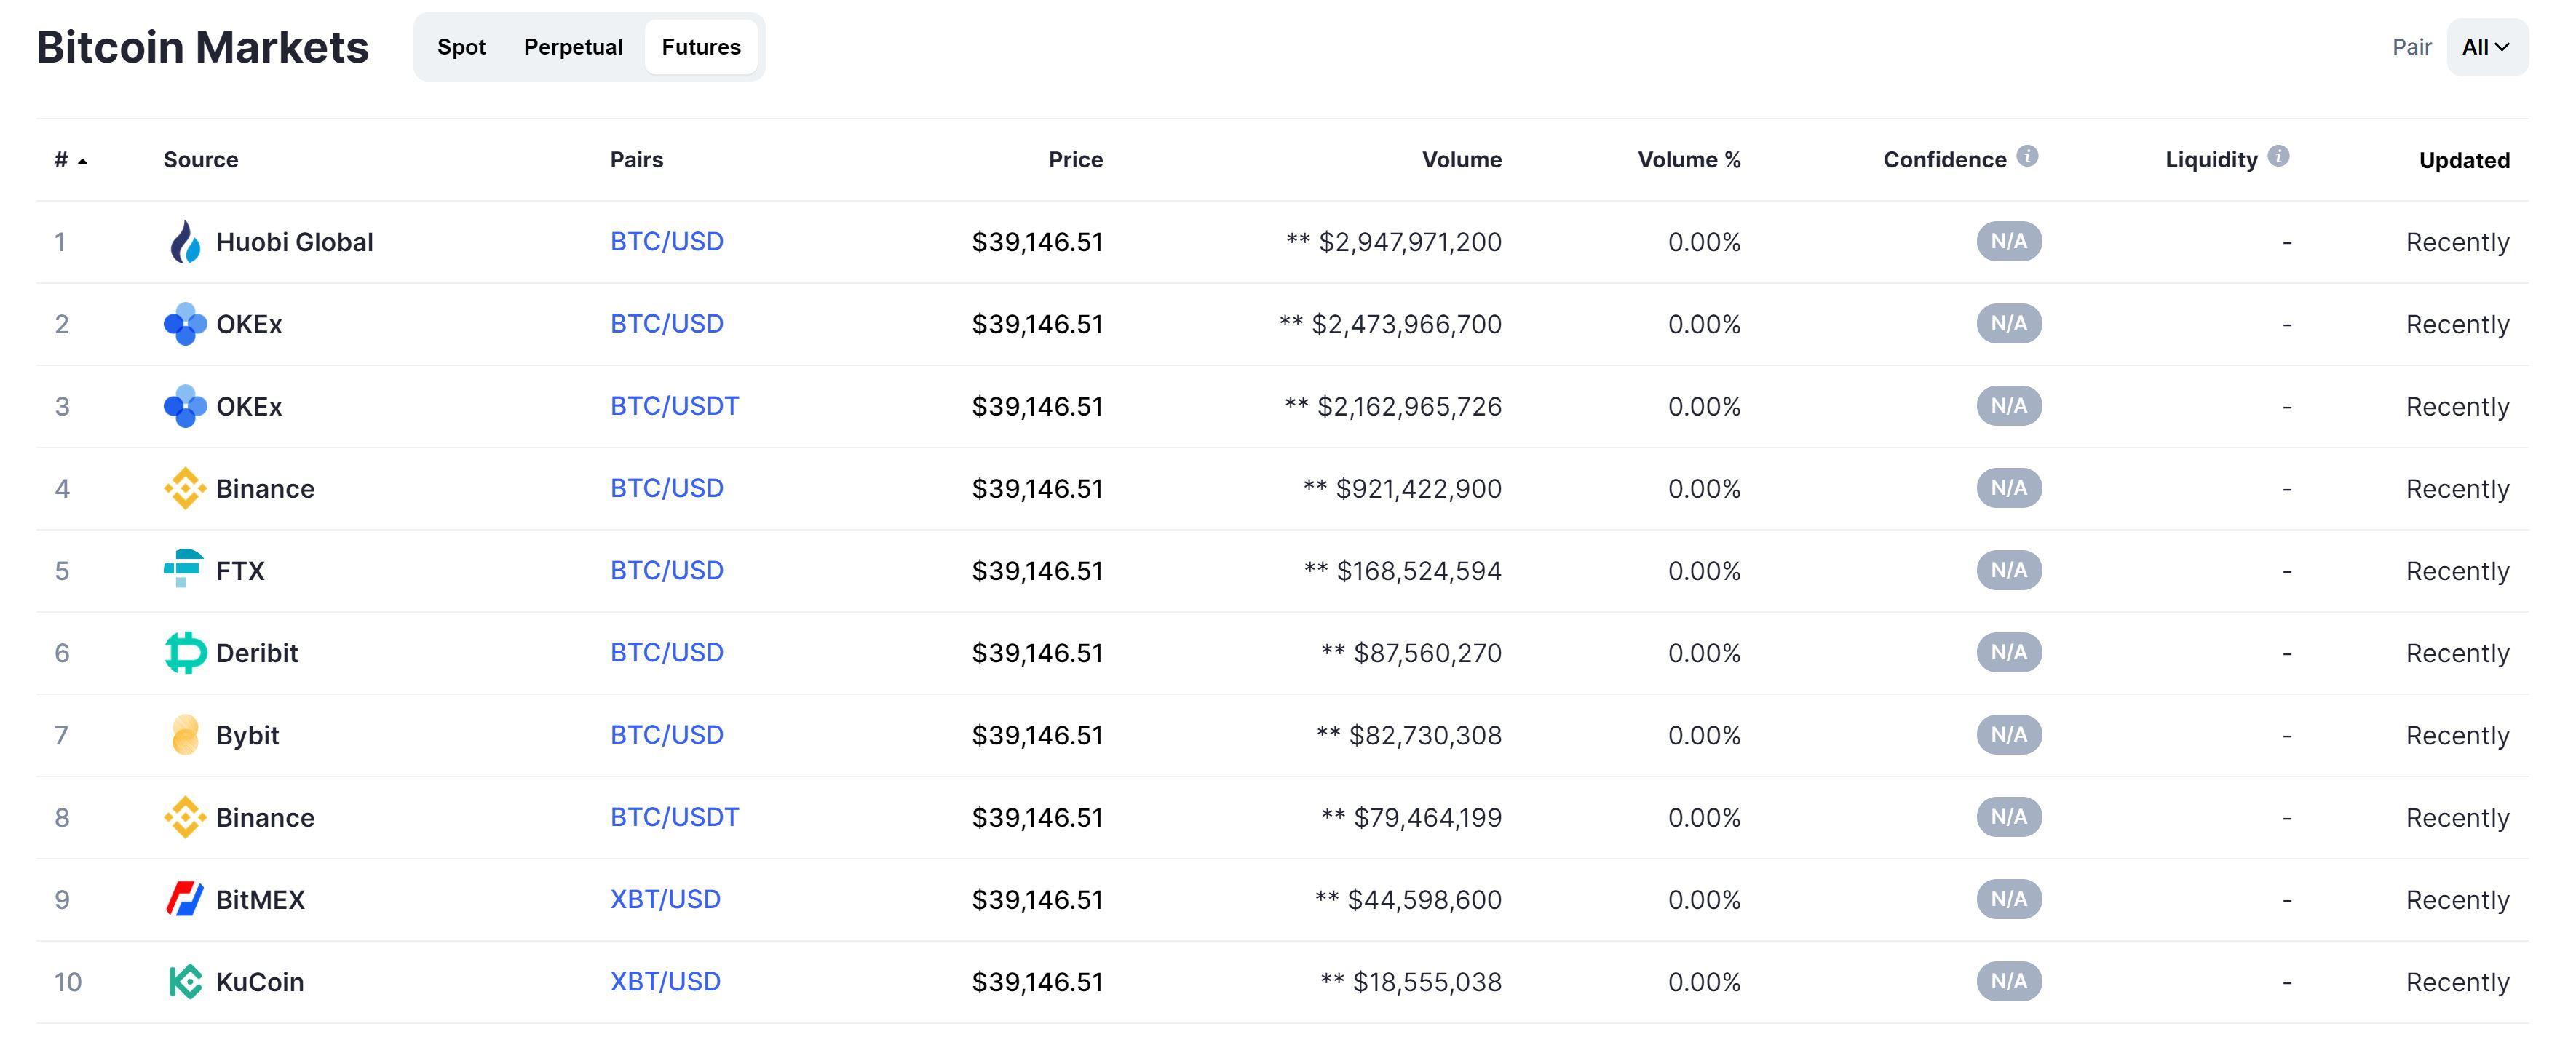 Pronóstico del precio de Bitcoin CoinMarketCap